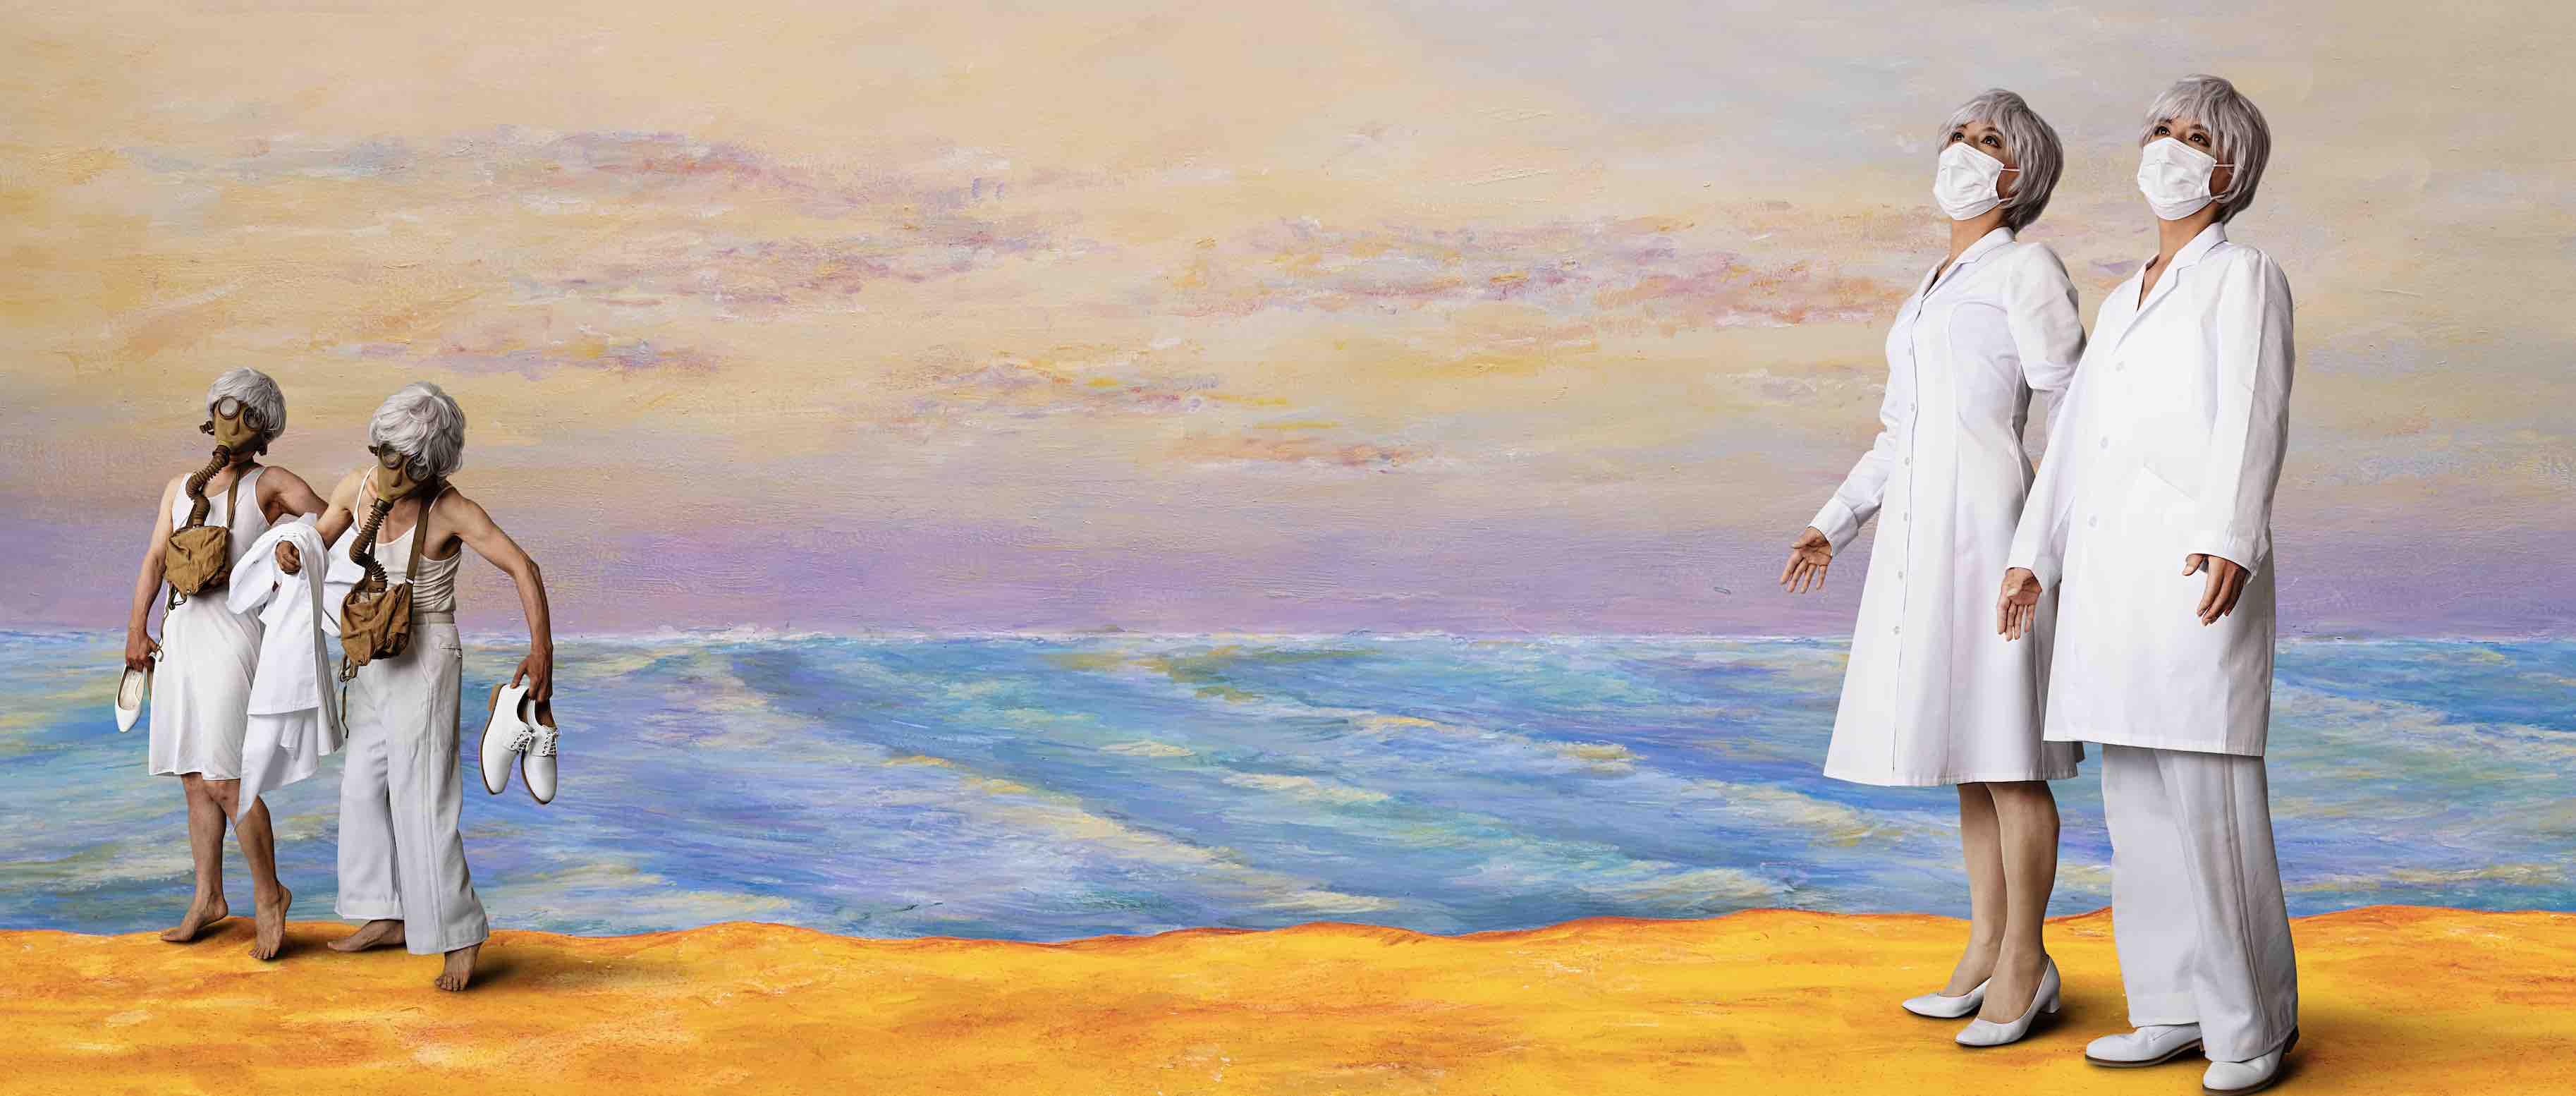 MORIMURA Yasumasa《M's Gift of the Sea No. 9: Return to Twilight》2021, collection of the artist